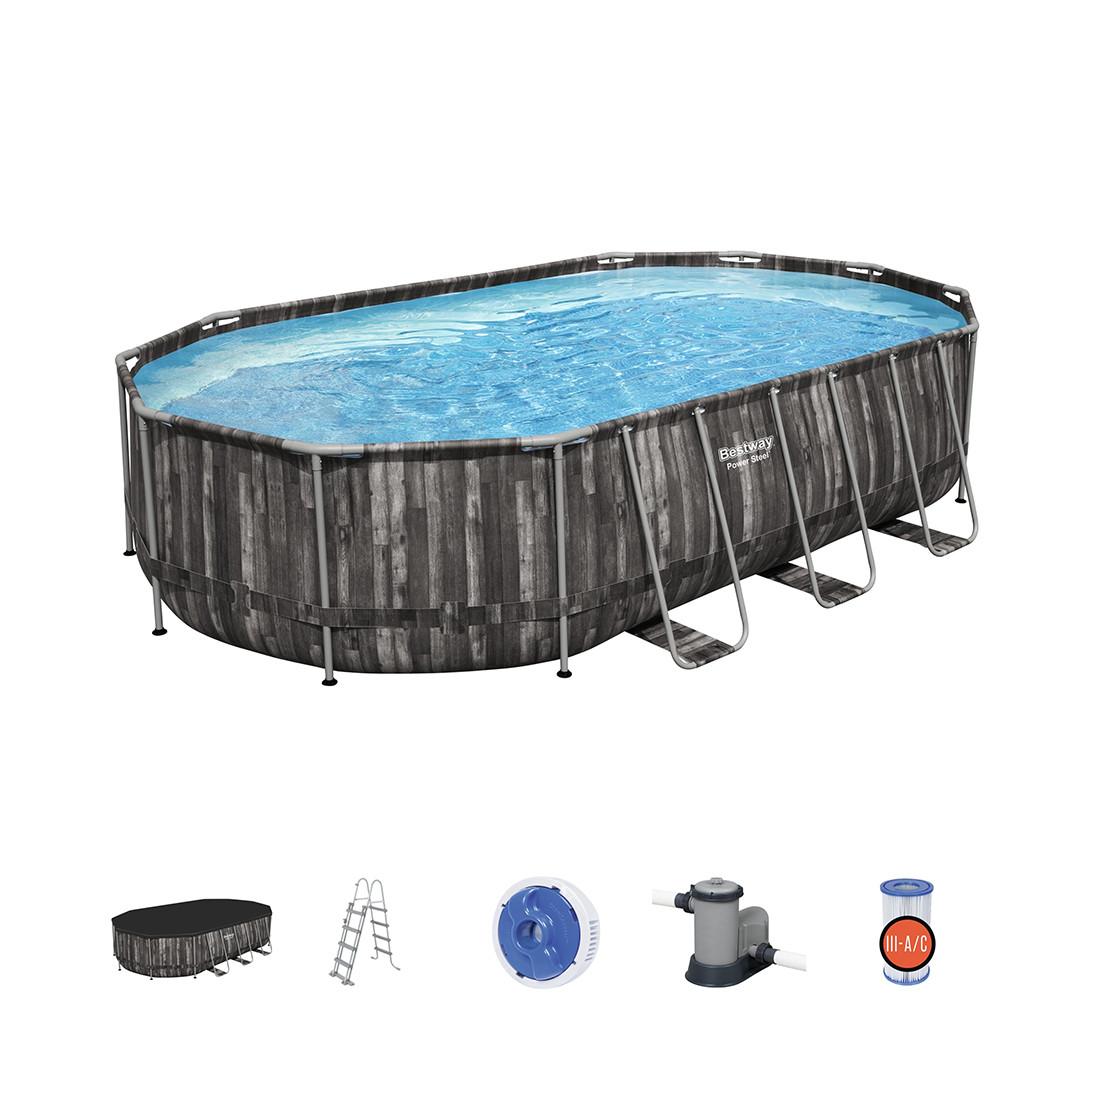 Каркасный бассейн Bestway 5611R